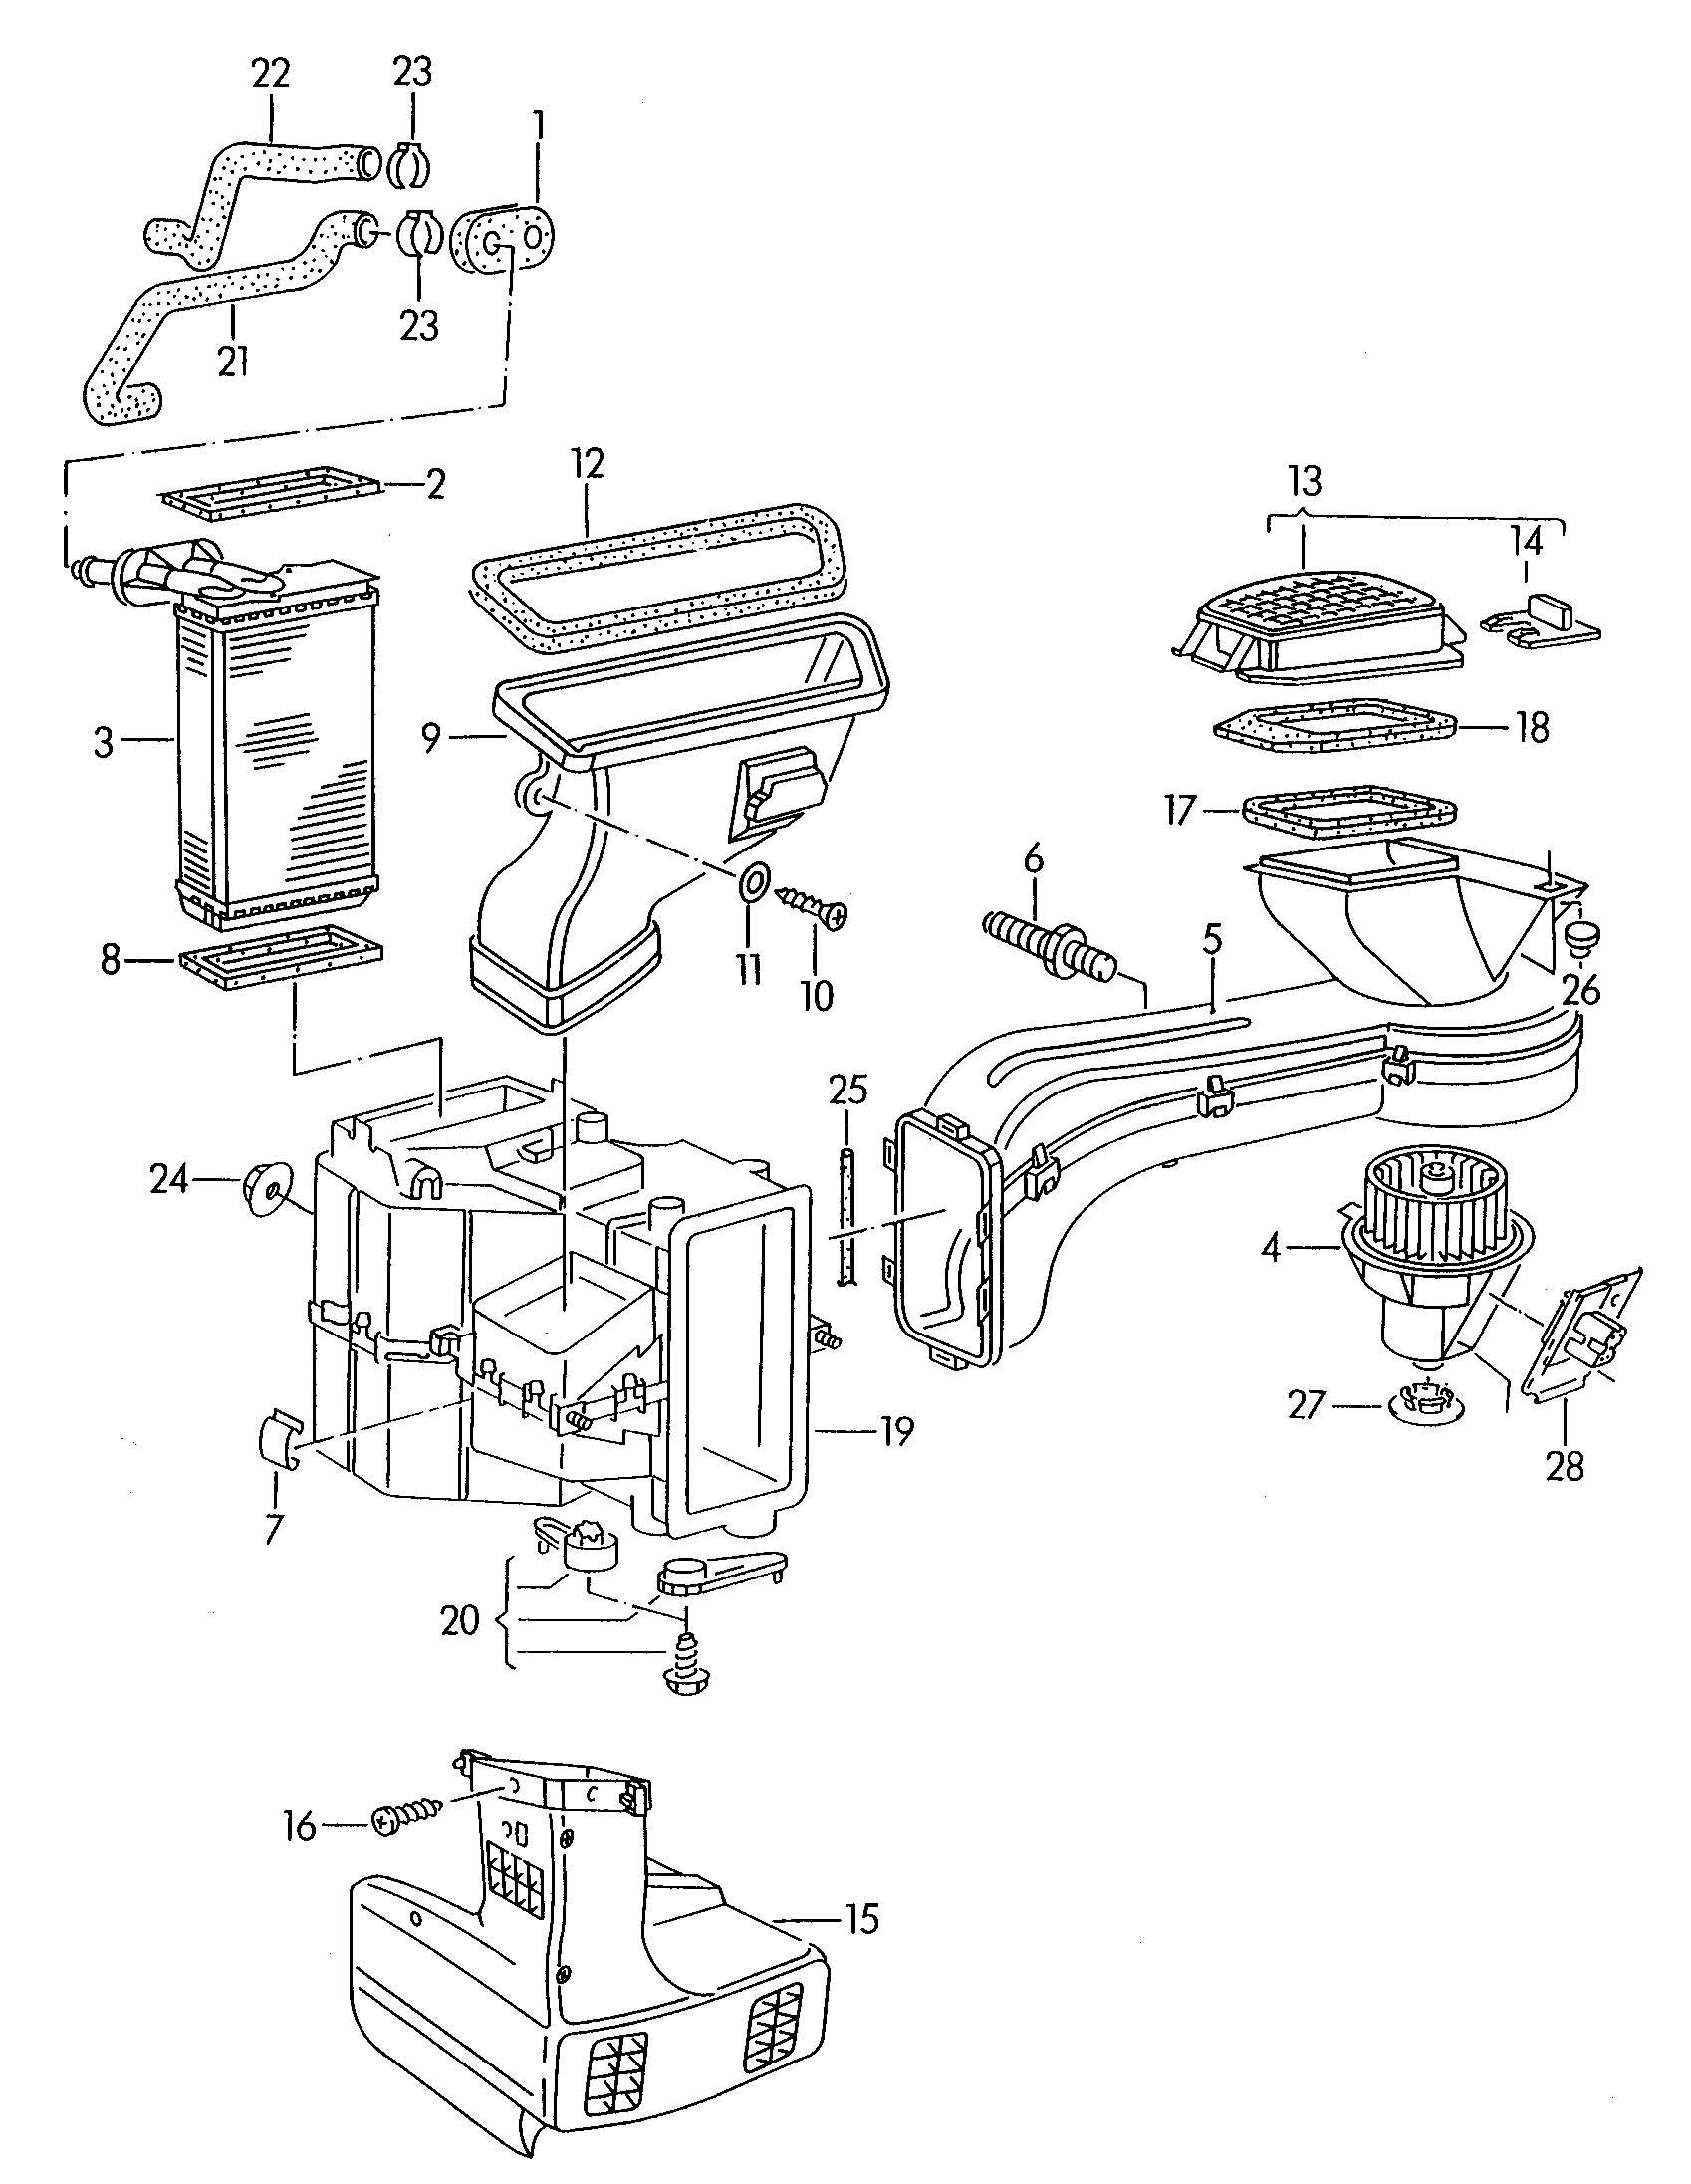 Service Manual Heater Coil Volkswagen Corrado How To